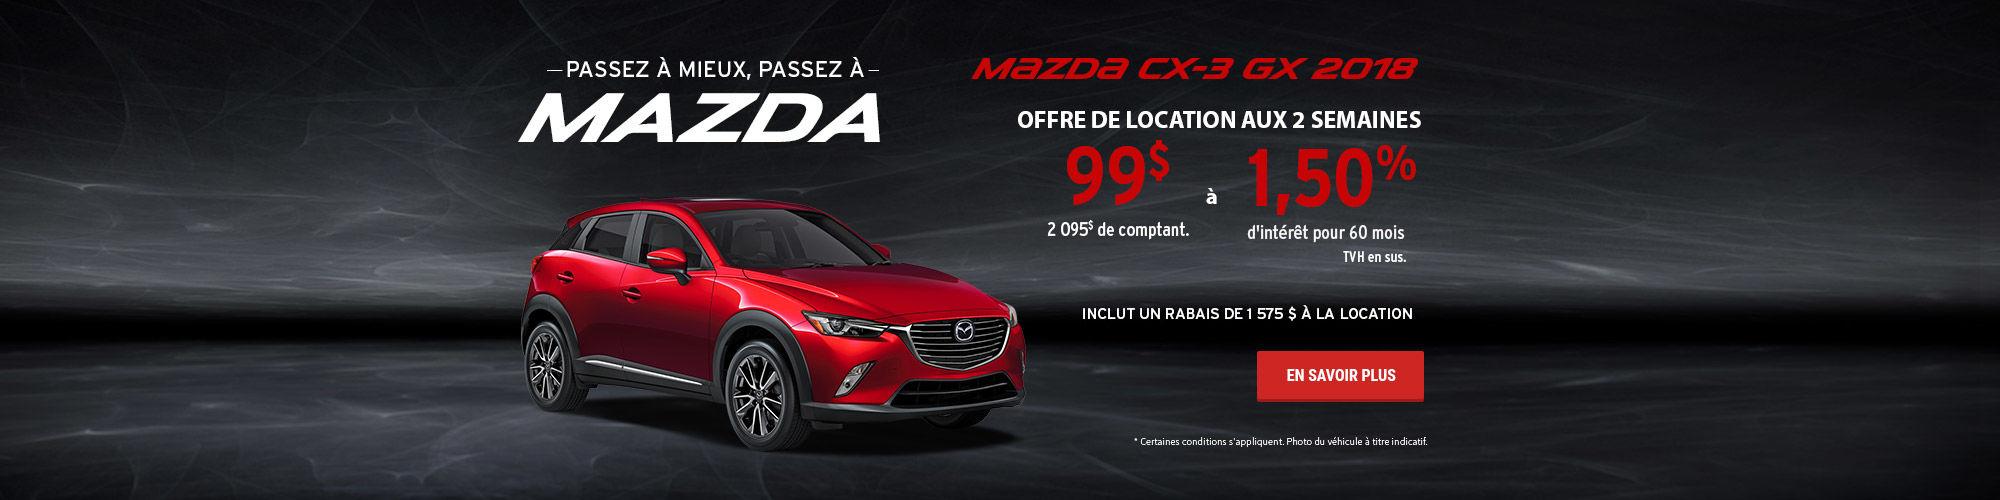 Passez à mieux, passez à Mazda - CX-3